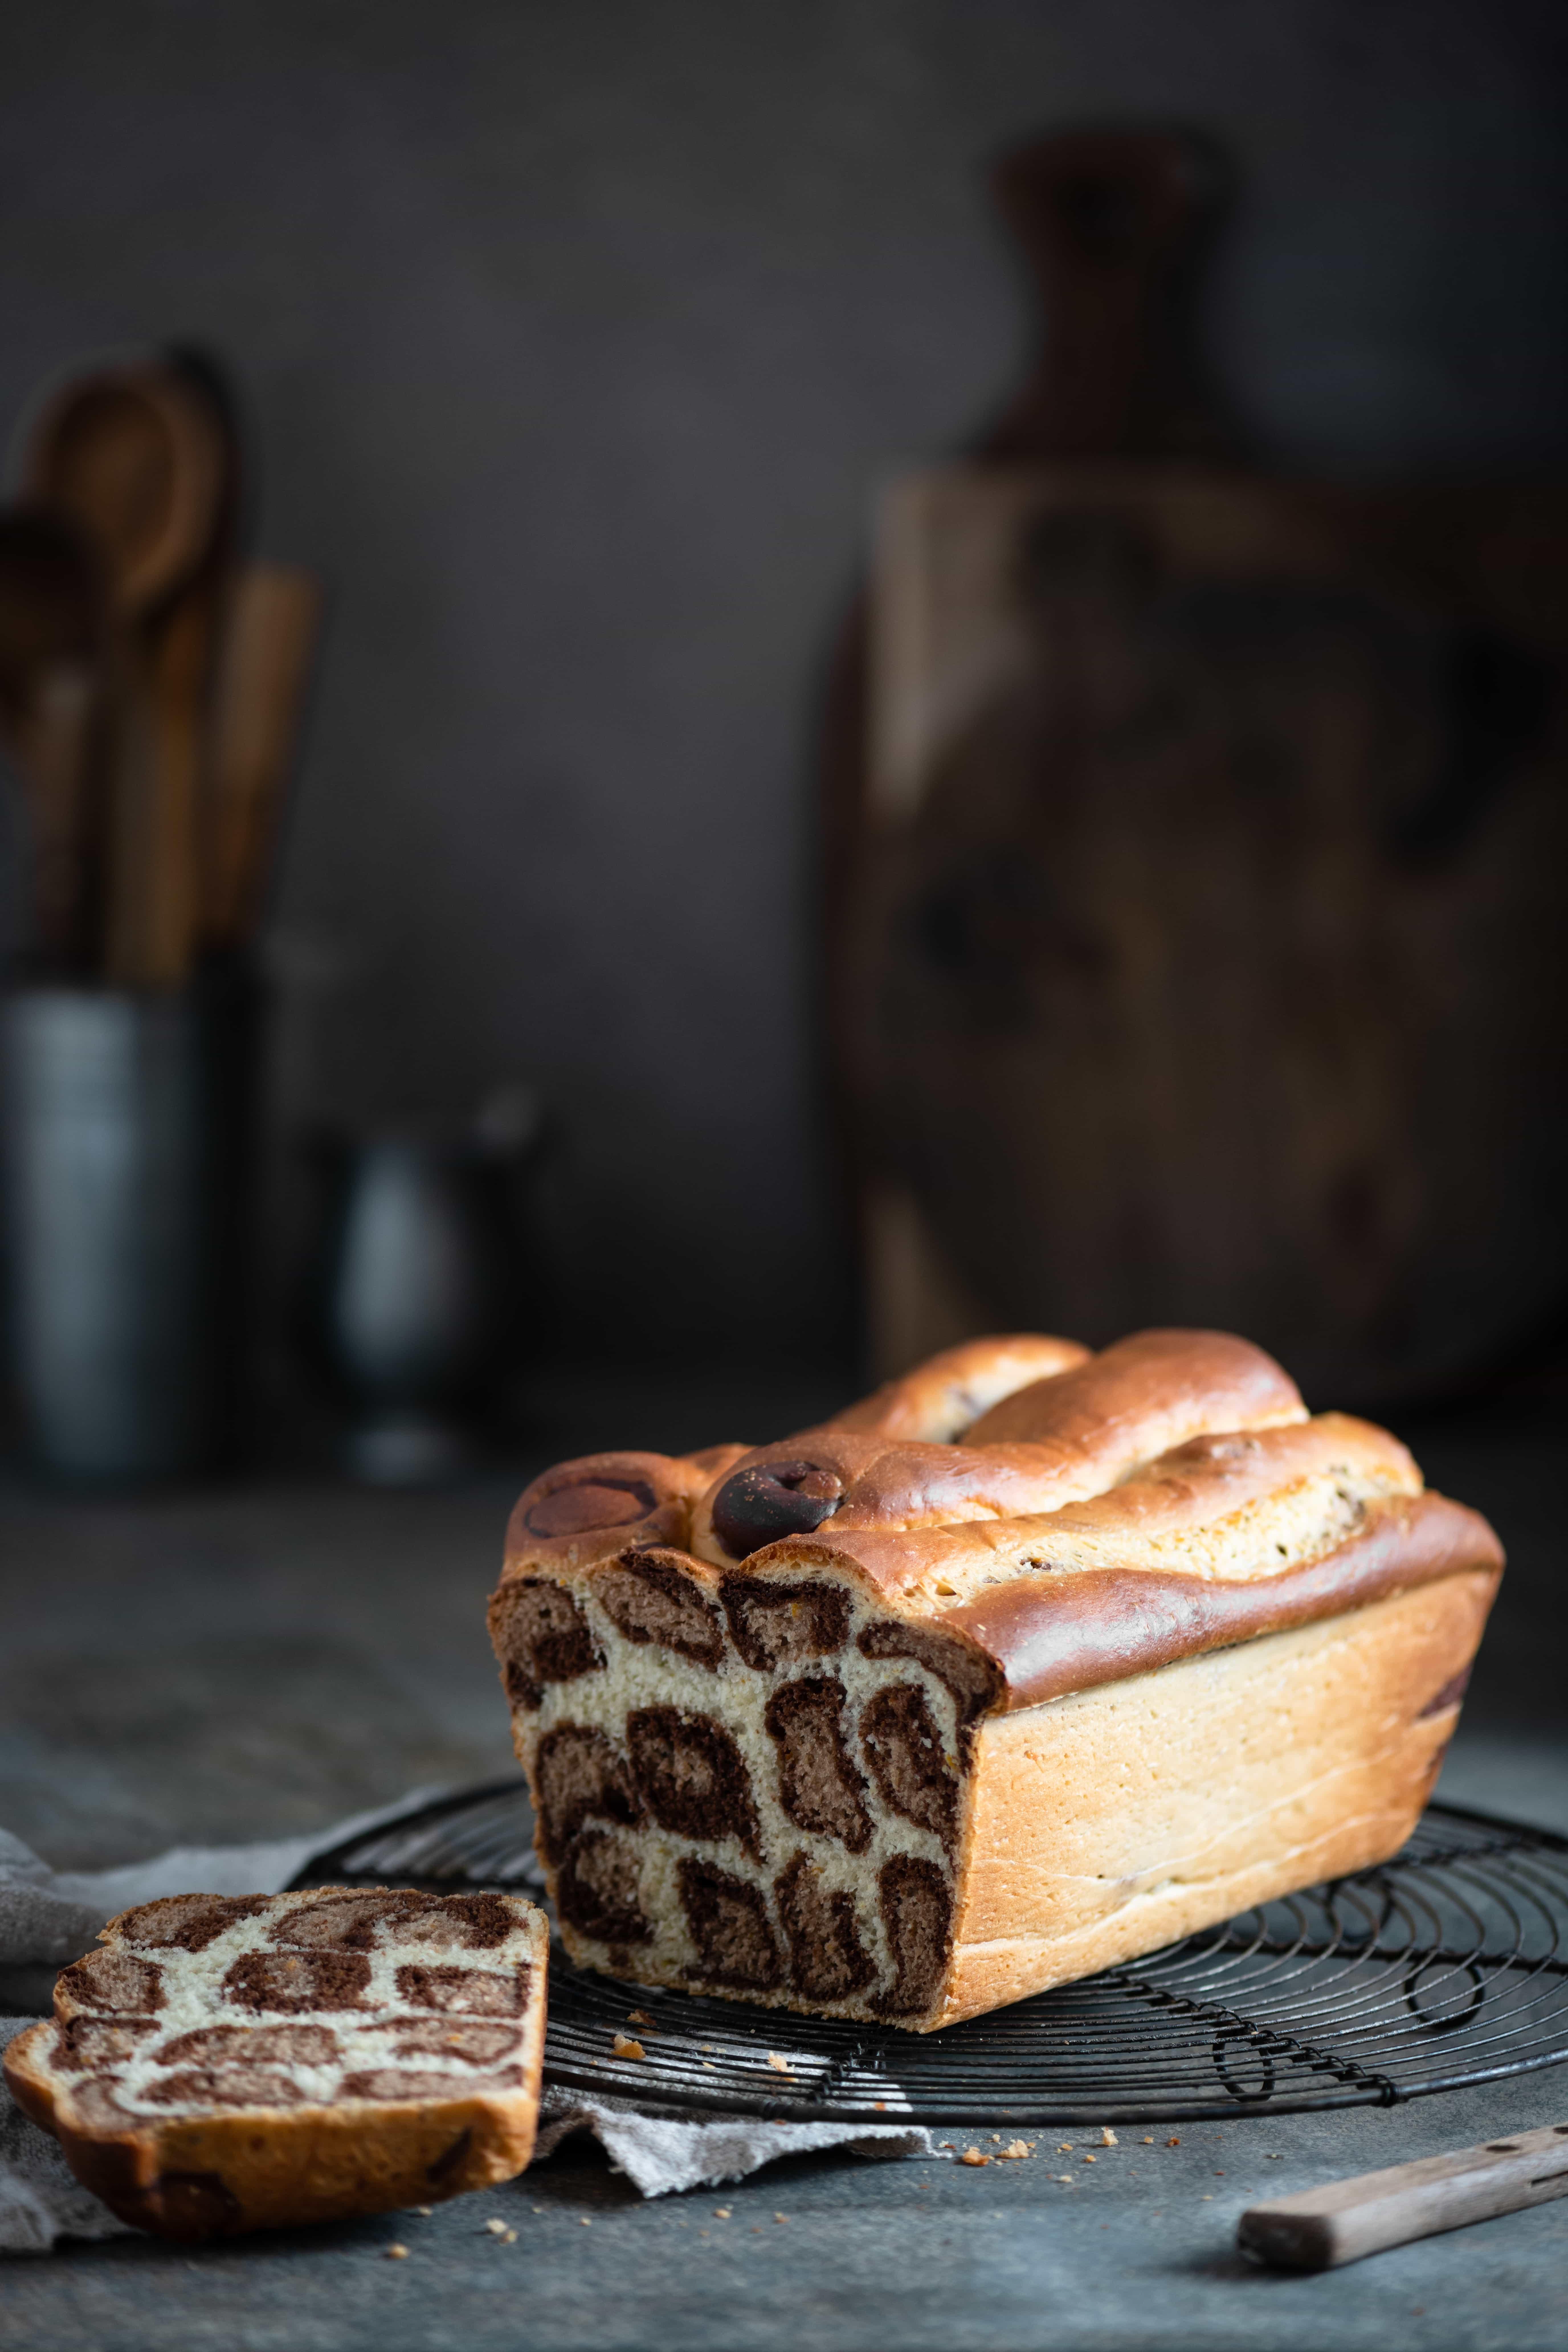 Leopard Bread made with dark chocolate and orange zest